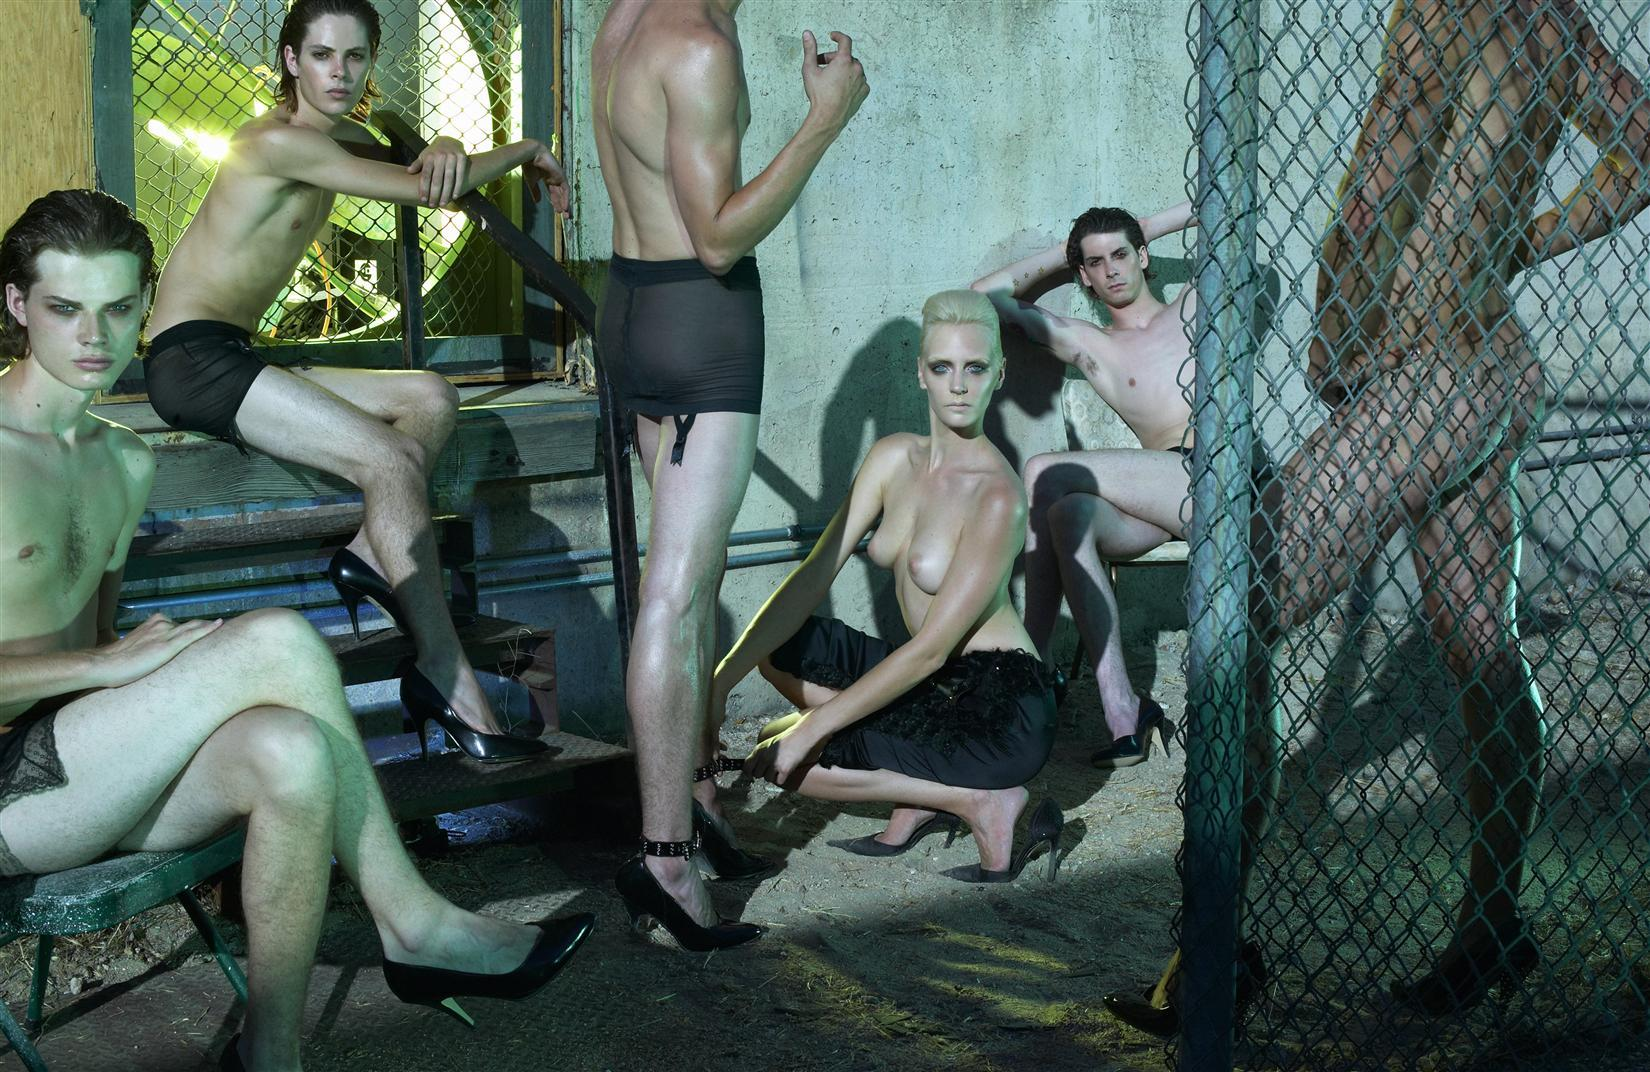 Fashionmonger - Página 19 Karen-elson-elise-crombez-missy-rayder-hannelore-knuts-jessica-stam-robert-boyd-holbrook-stefan-forrester-walker-rj-chris-mcmillen-harry-kinhead-kian-mitchem-by-steven-meisel-f10